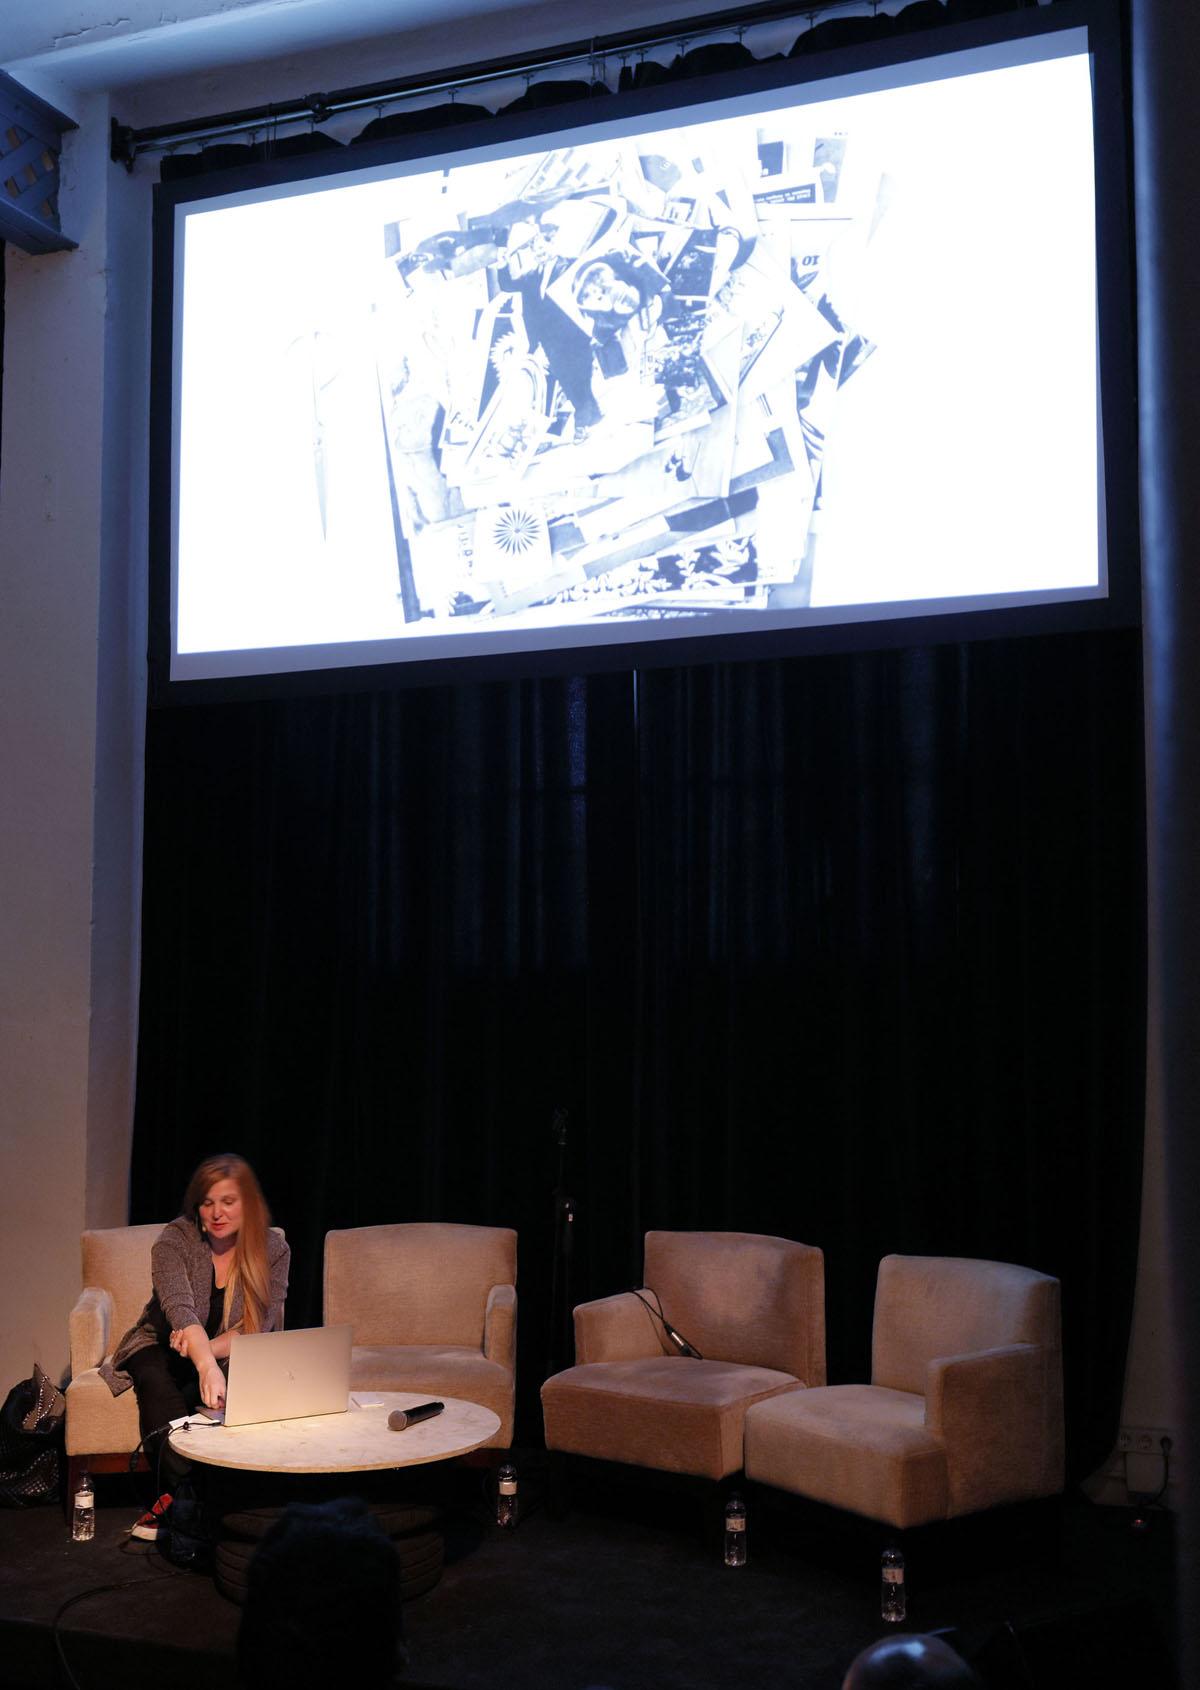 conferencia_barcelona_utopiamarket_08